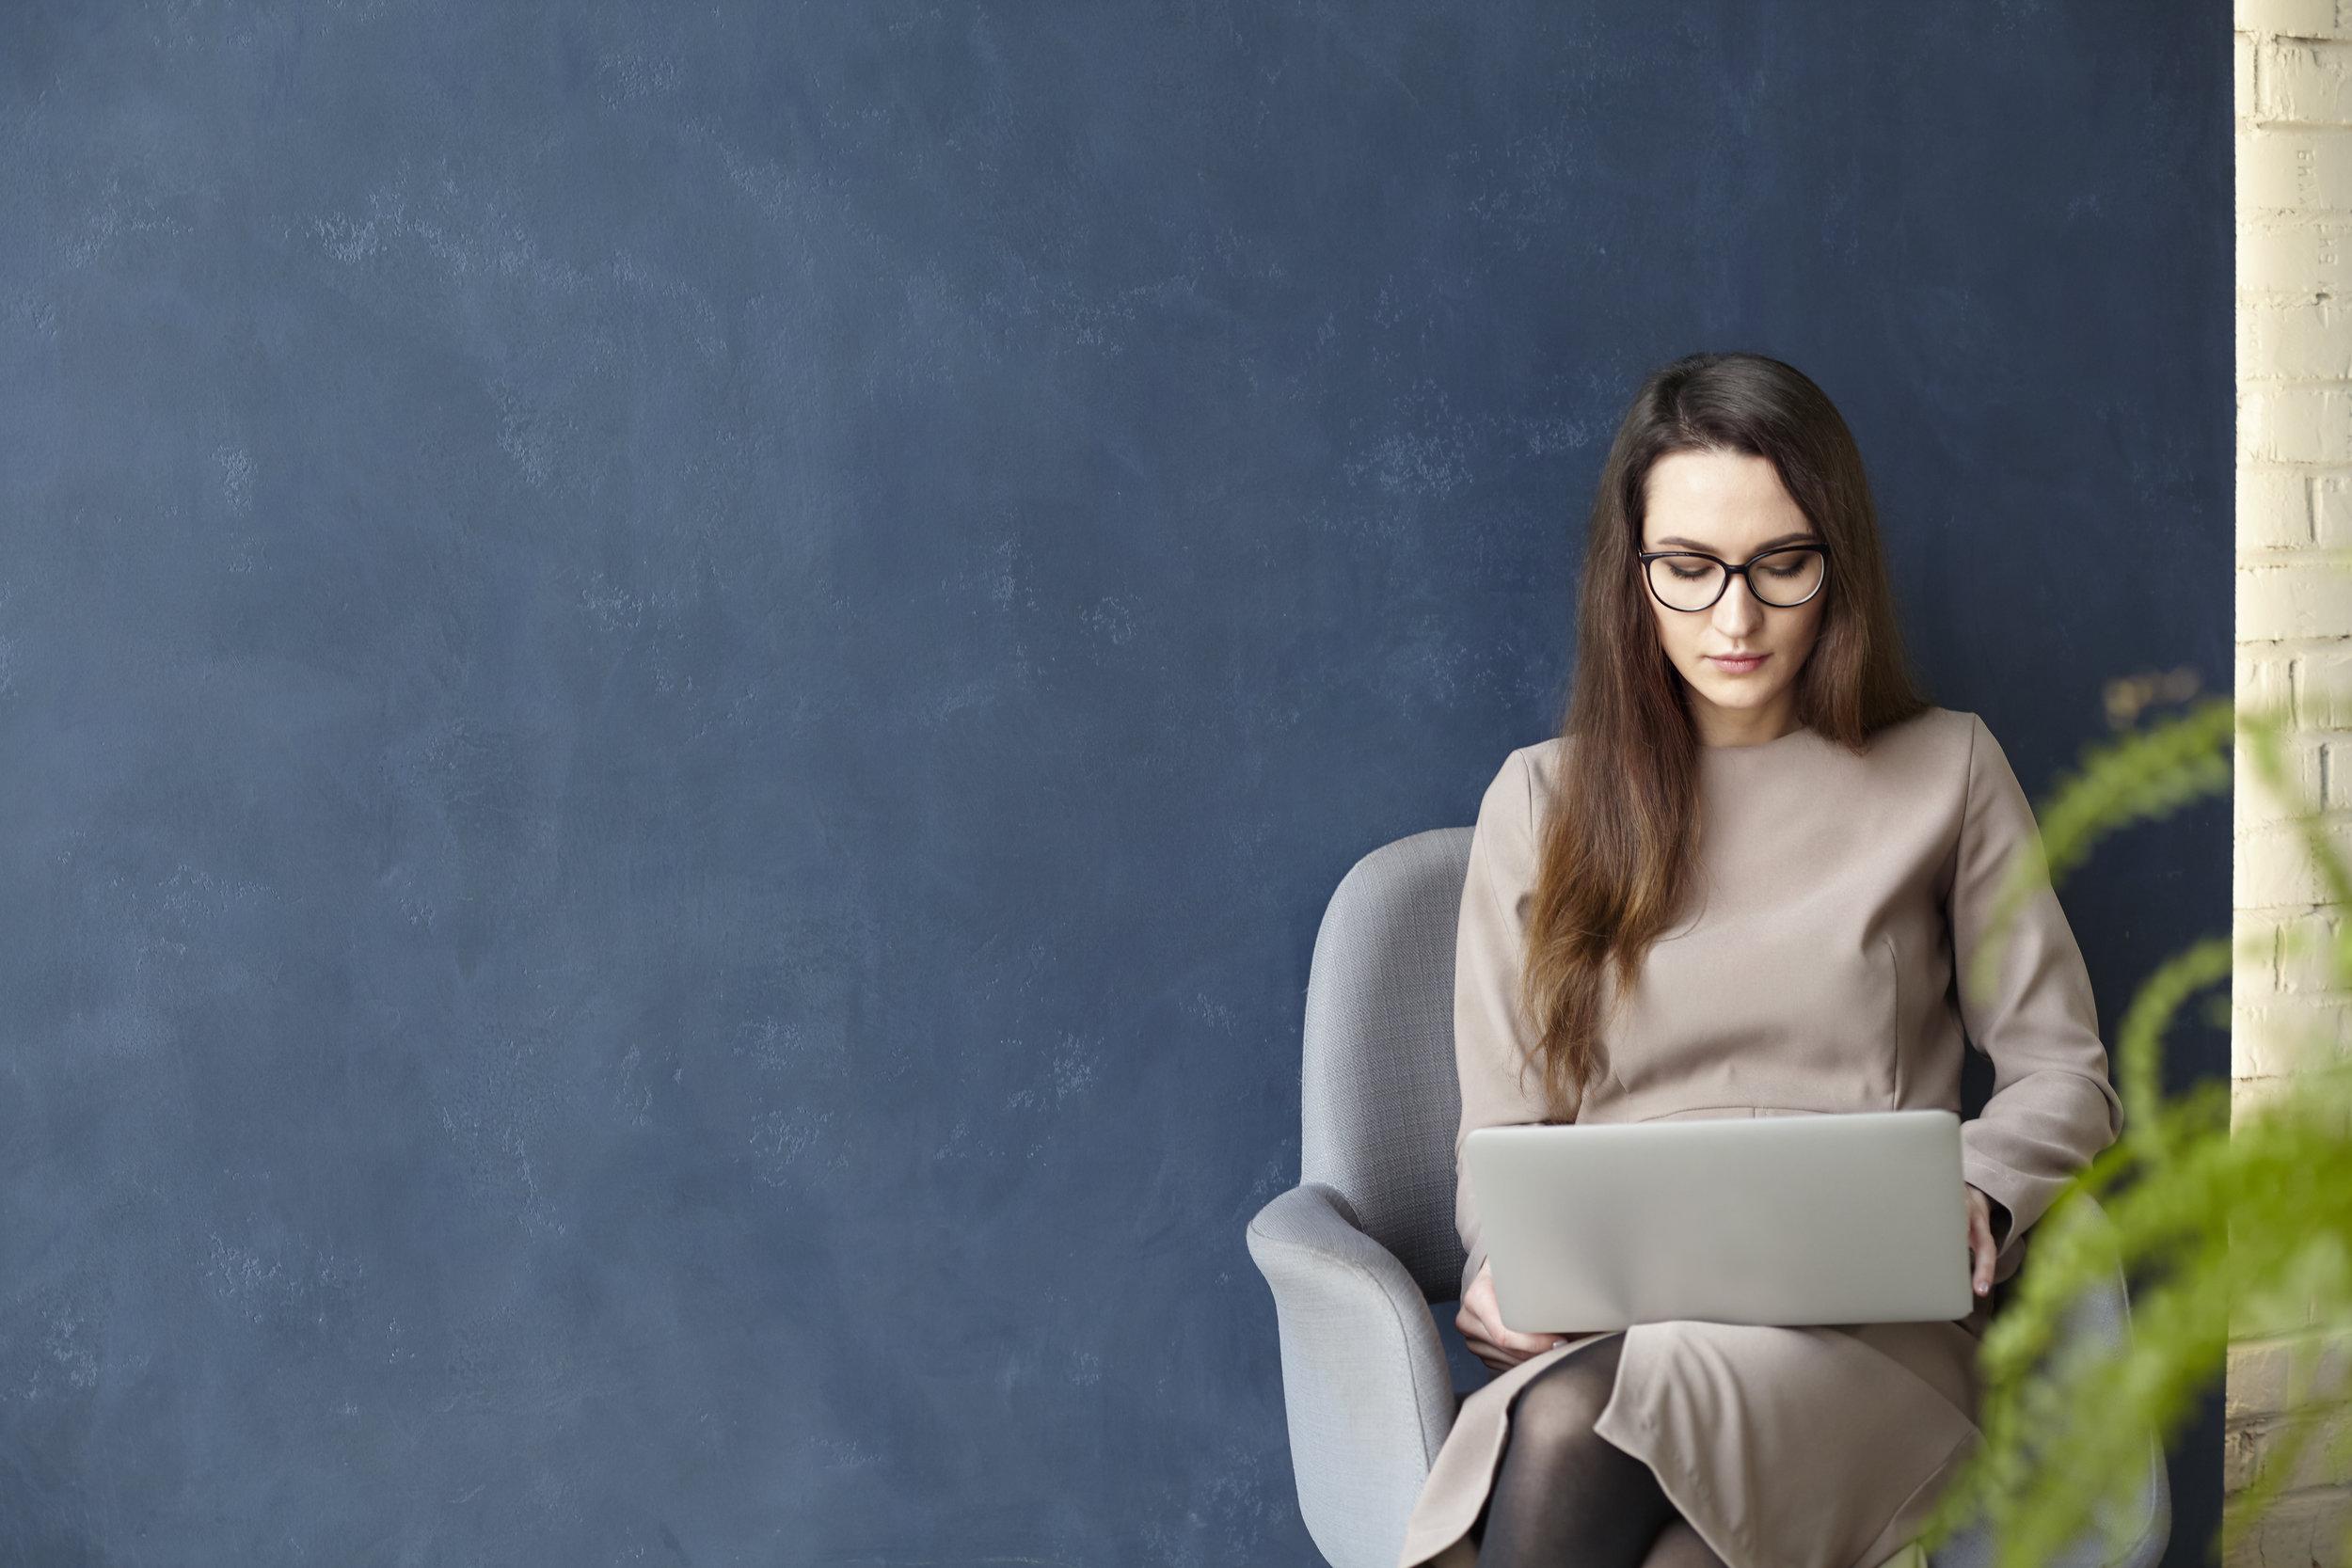 Beautiful-businesswoman-working-on-laptop-while-sitting-in-modern-loft-office.-Dark-blue-wall-background,-day-light-653222072_6000x4000.jpeg